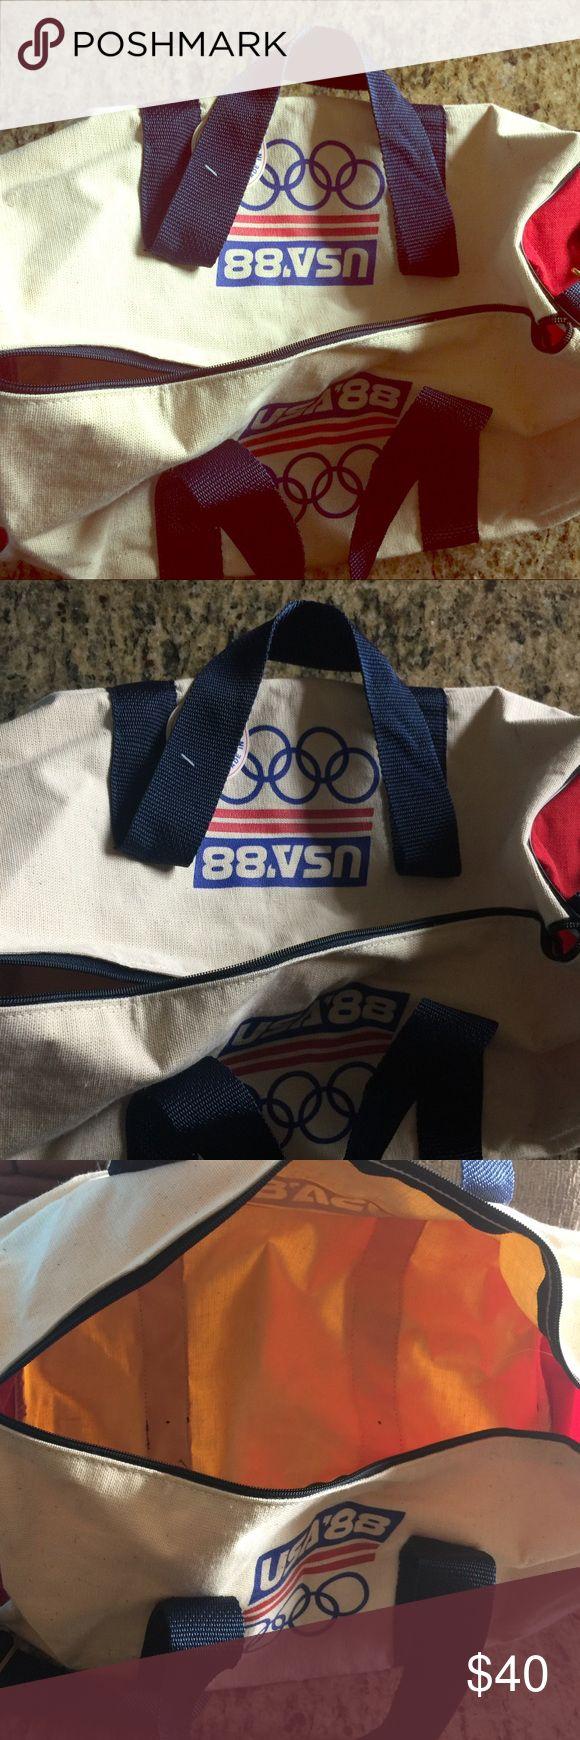 1988 Olympic Duffle Bag USA Has original tags Bags